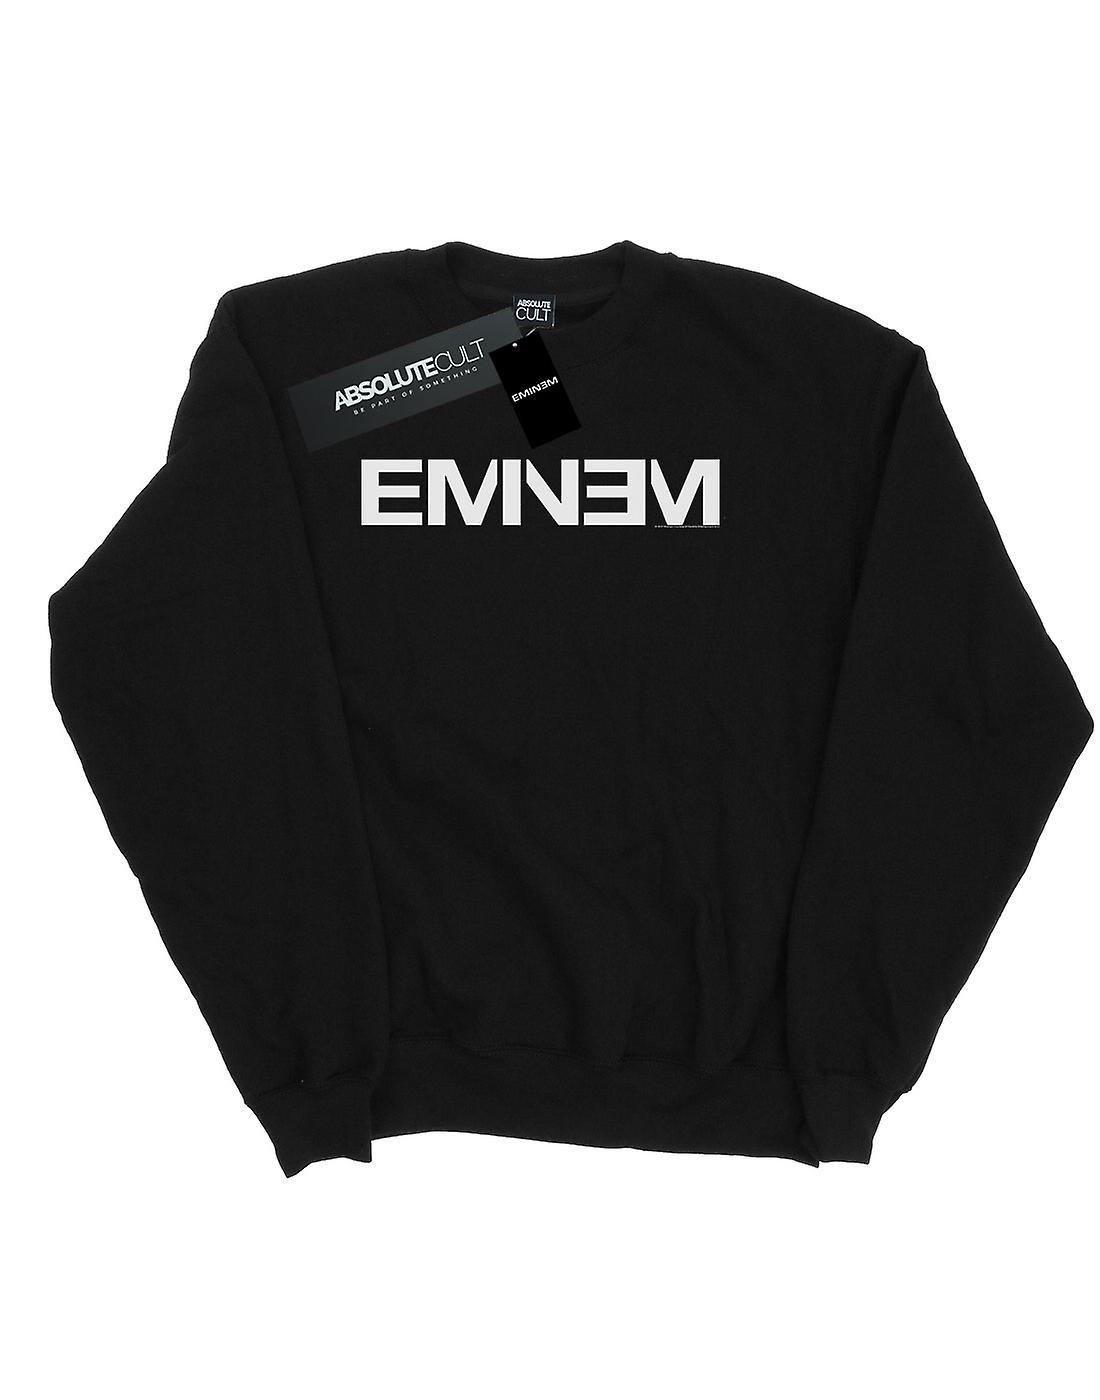 Eminem Men's Plain Text Sweatshirt